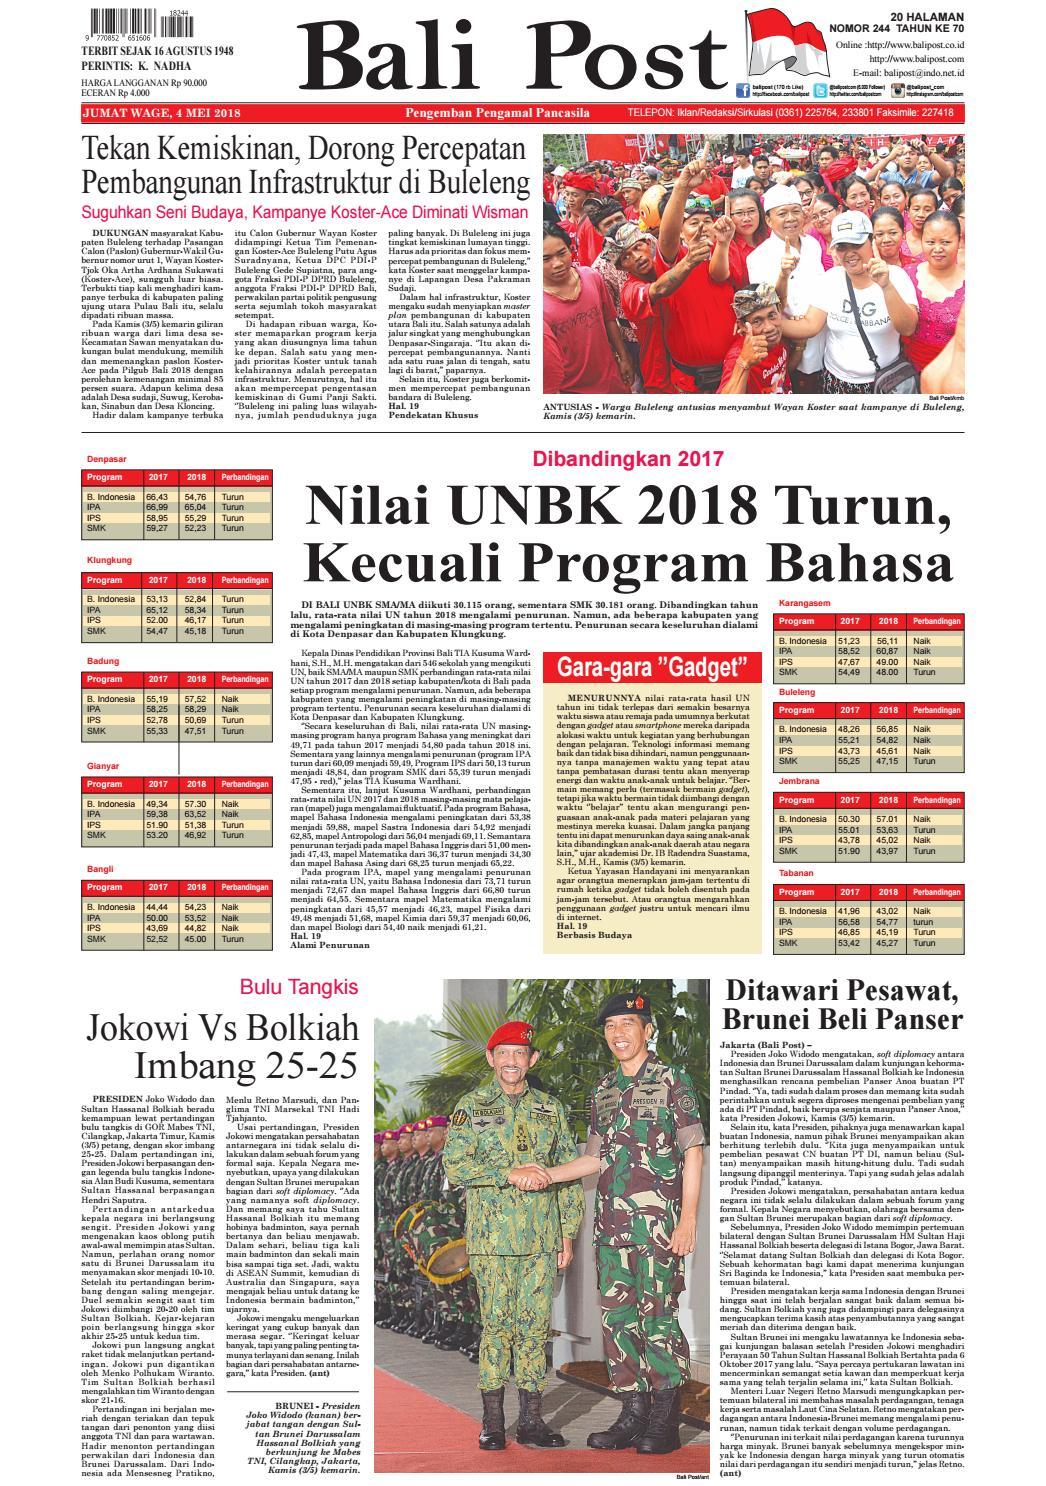 Edisi 4 Mei 2018 Balipostcom By E Paper Kmb Issuu Produk Ukm Bumn Suscho Sus Coklat Surabaya